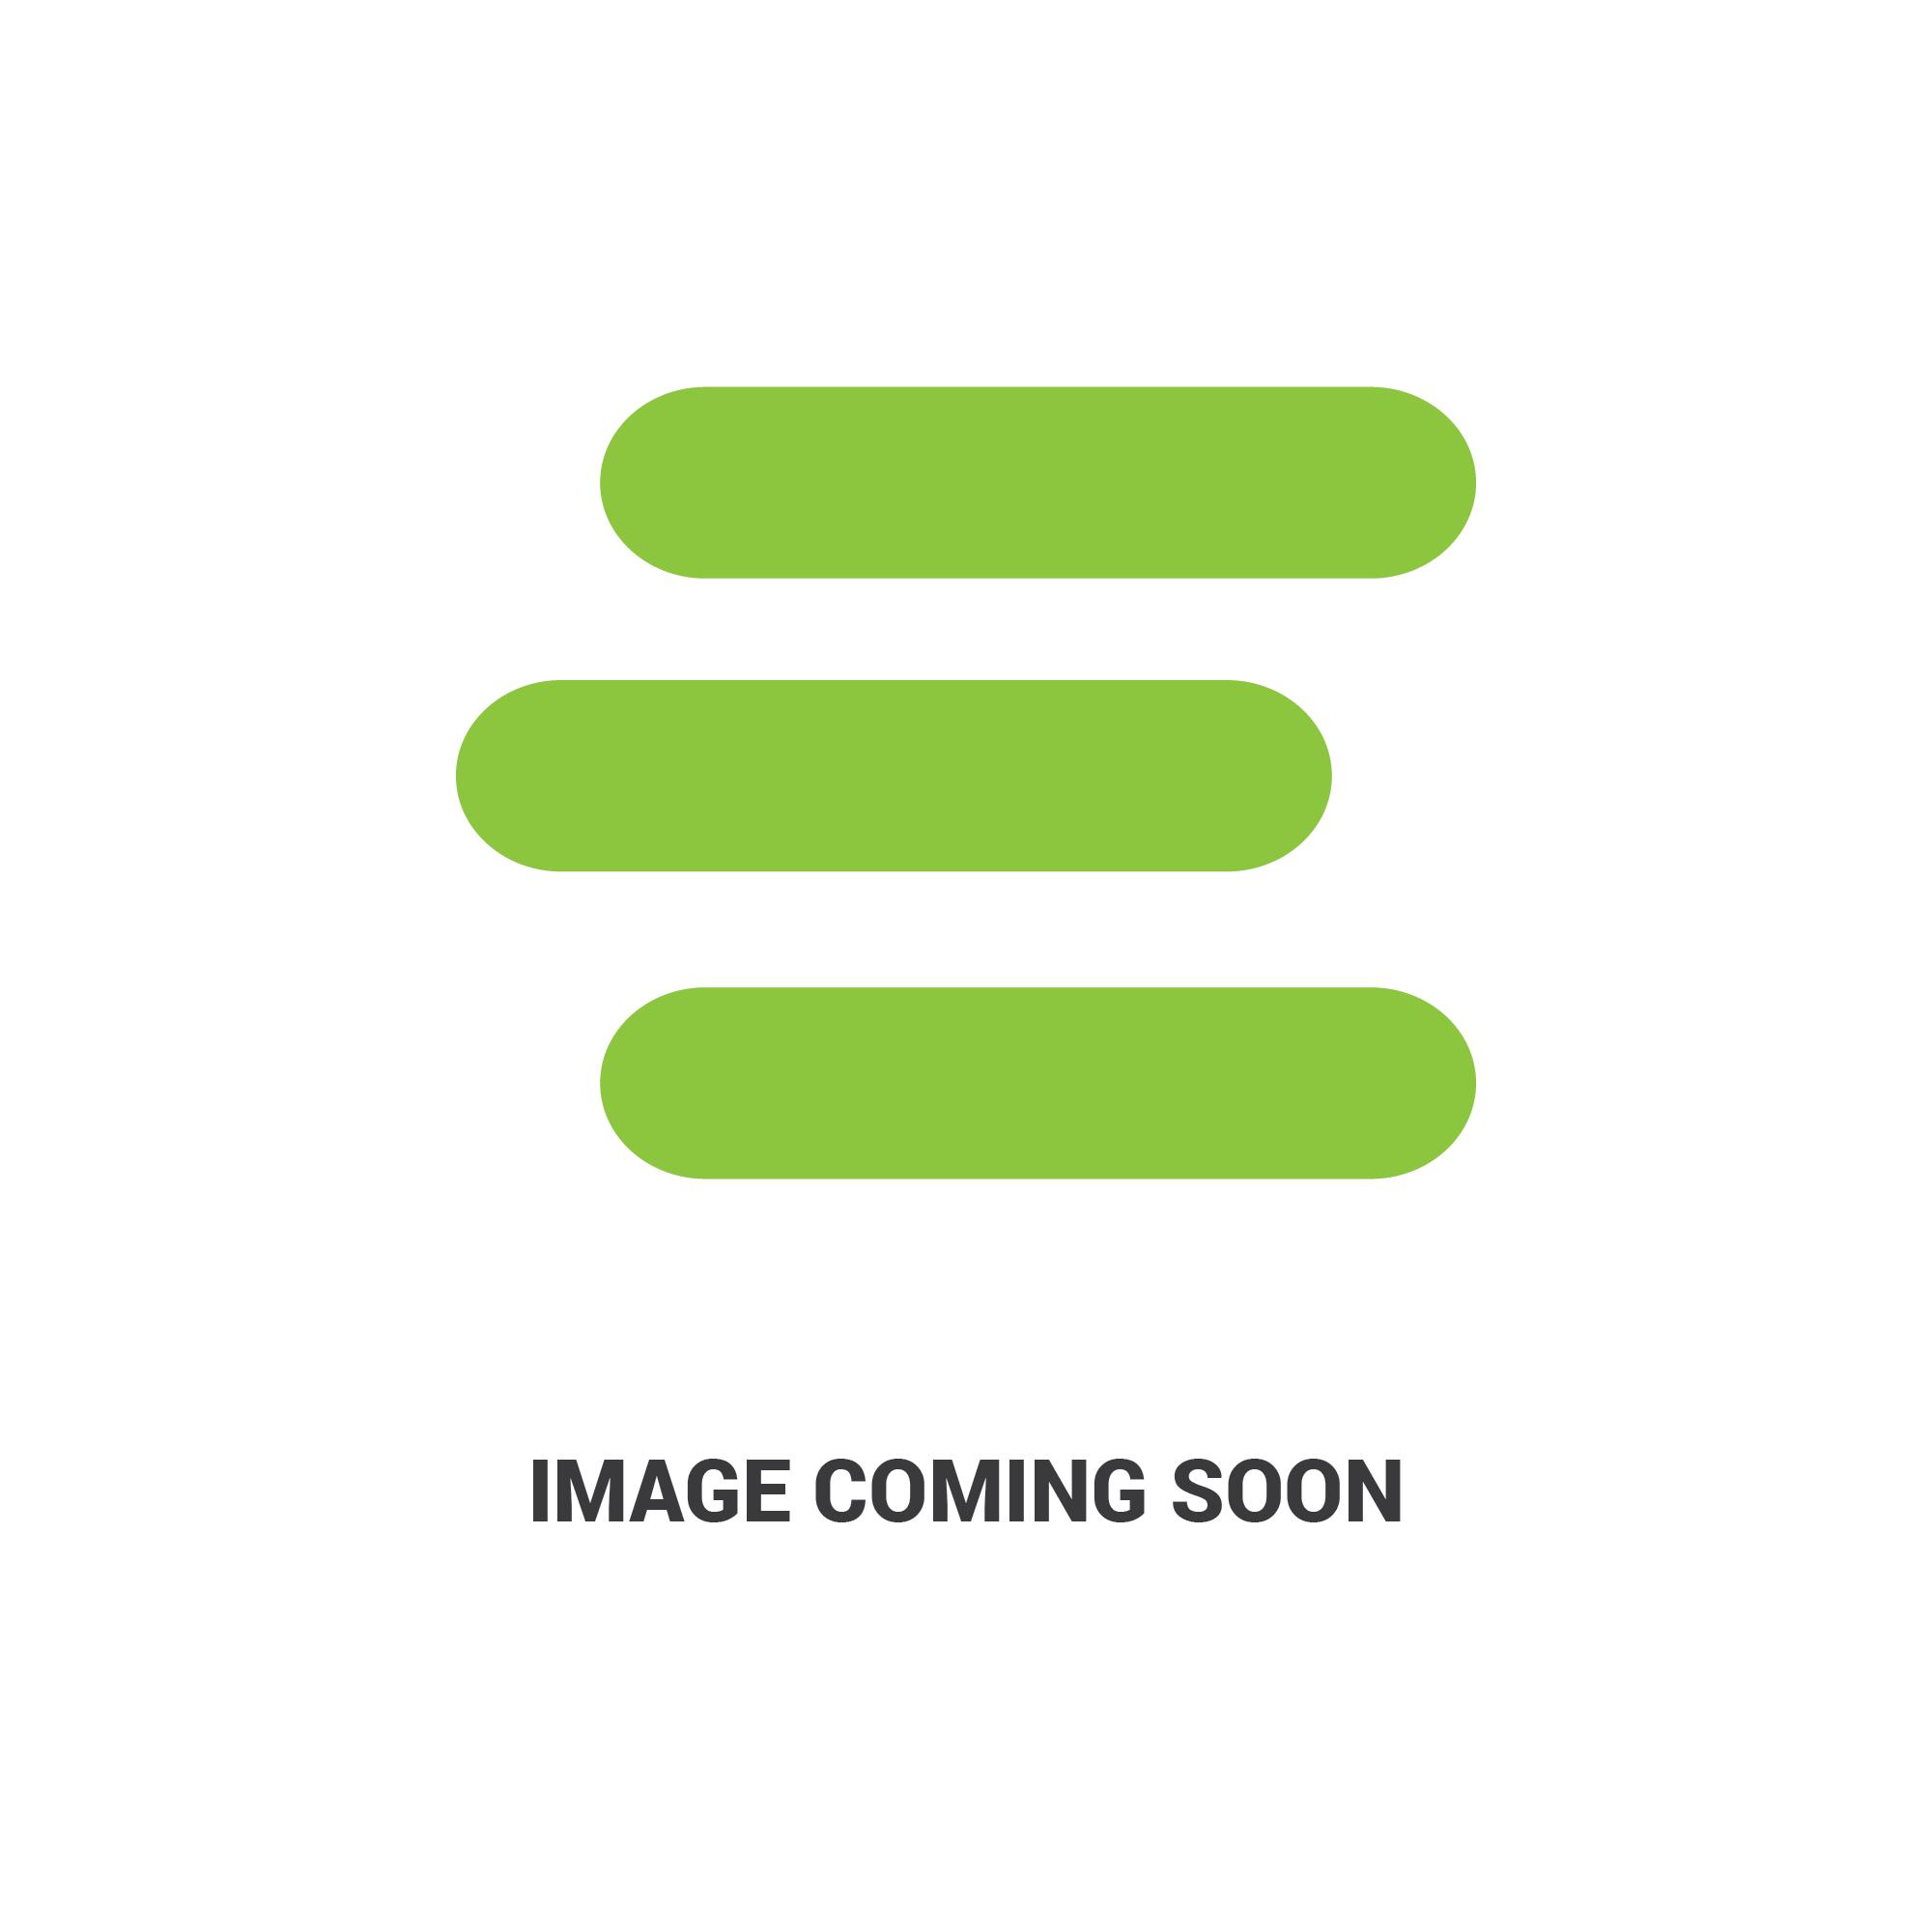 E-83957098edit 1.jpg